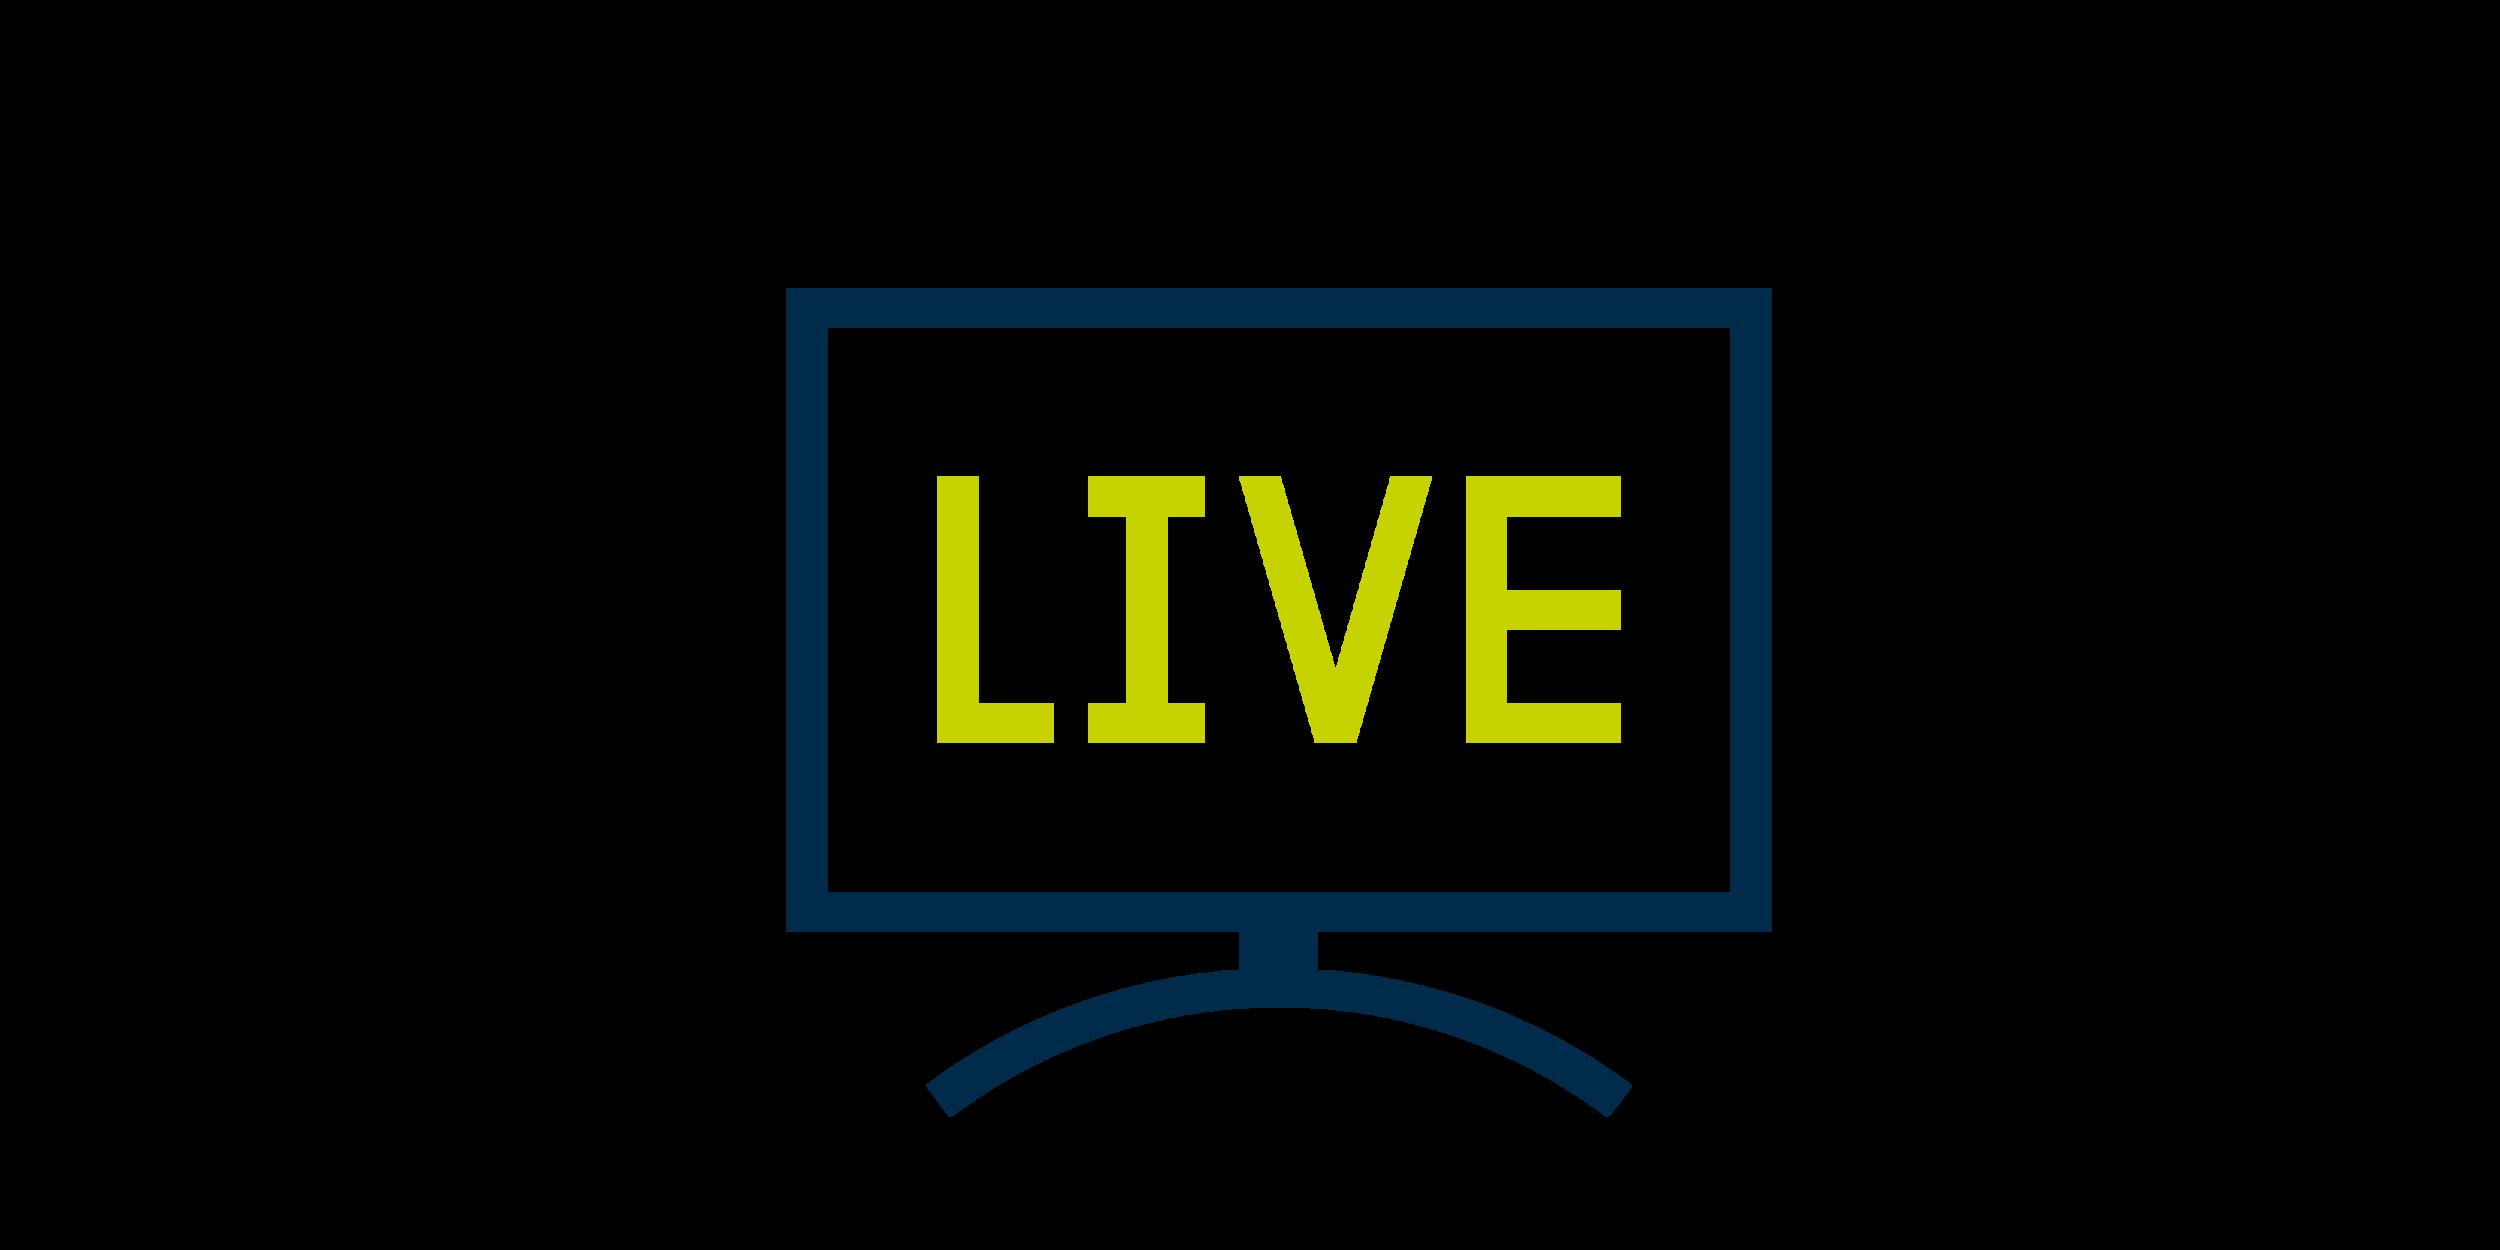 Live Sport - Shown on big screen TV's